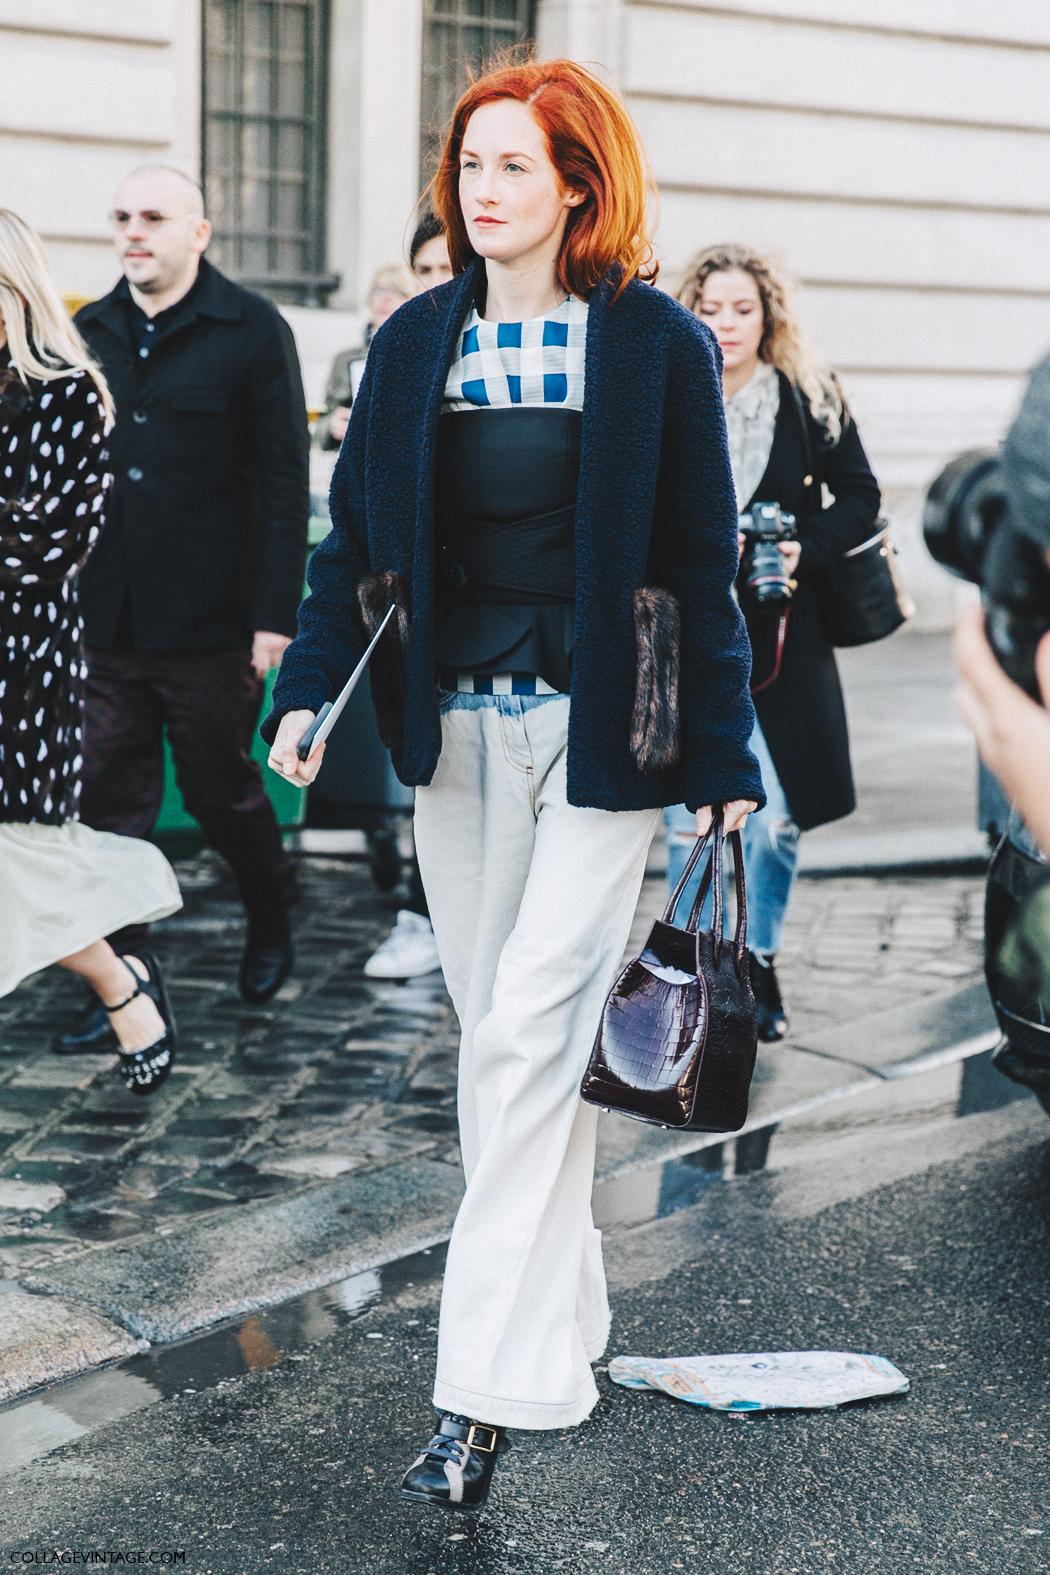 PFW-Paris_Fashion_Week_Fall_2016-Street_Style-Collage_Vintage-Taylor_Tomasi_Hill-1